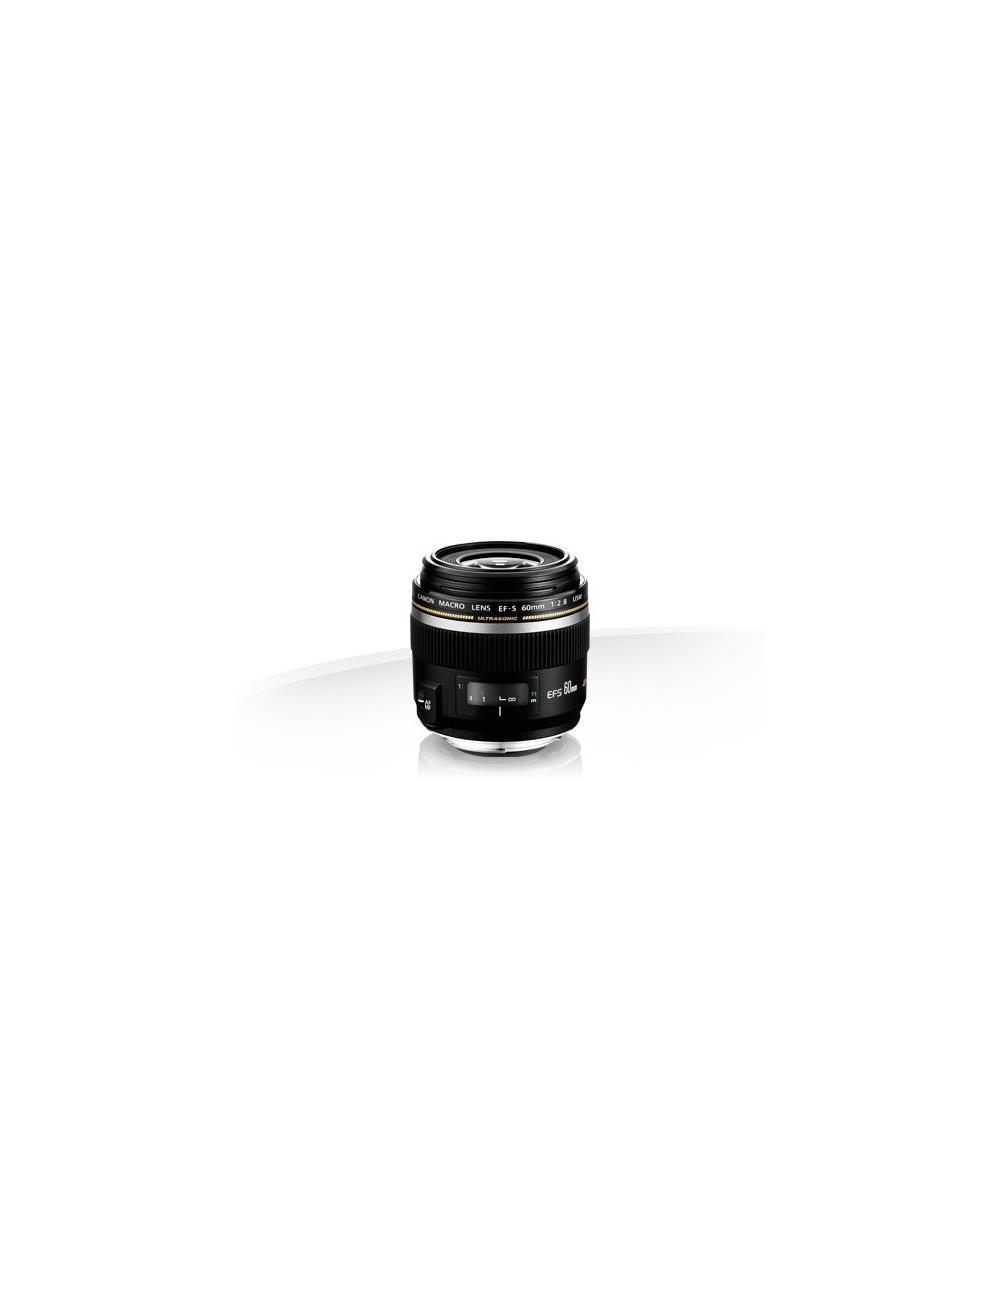 Canon - EF-S 60 MM 2.8 USM MACRO